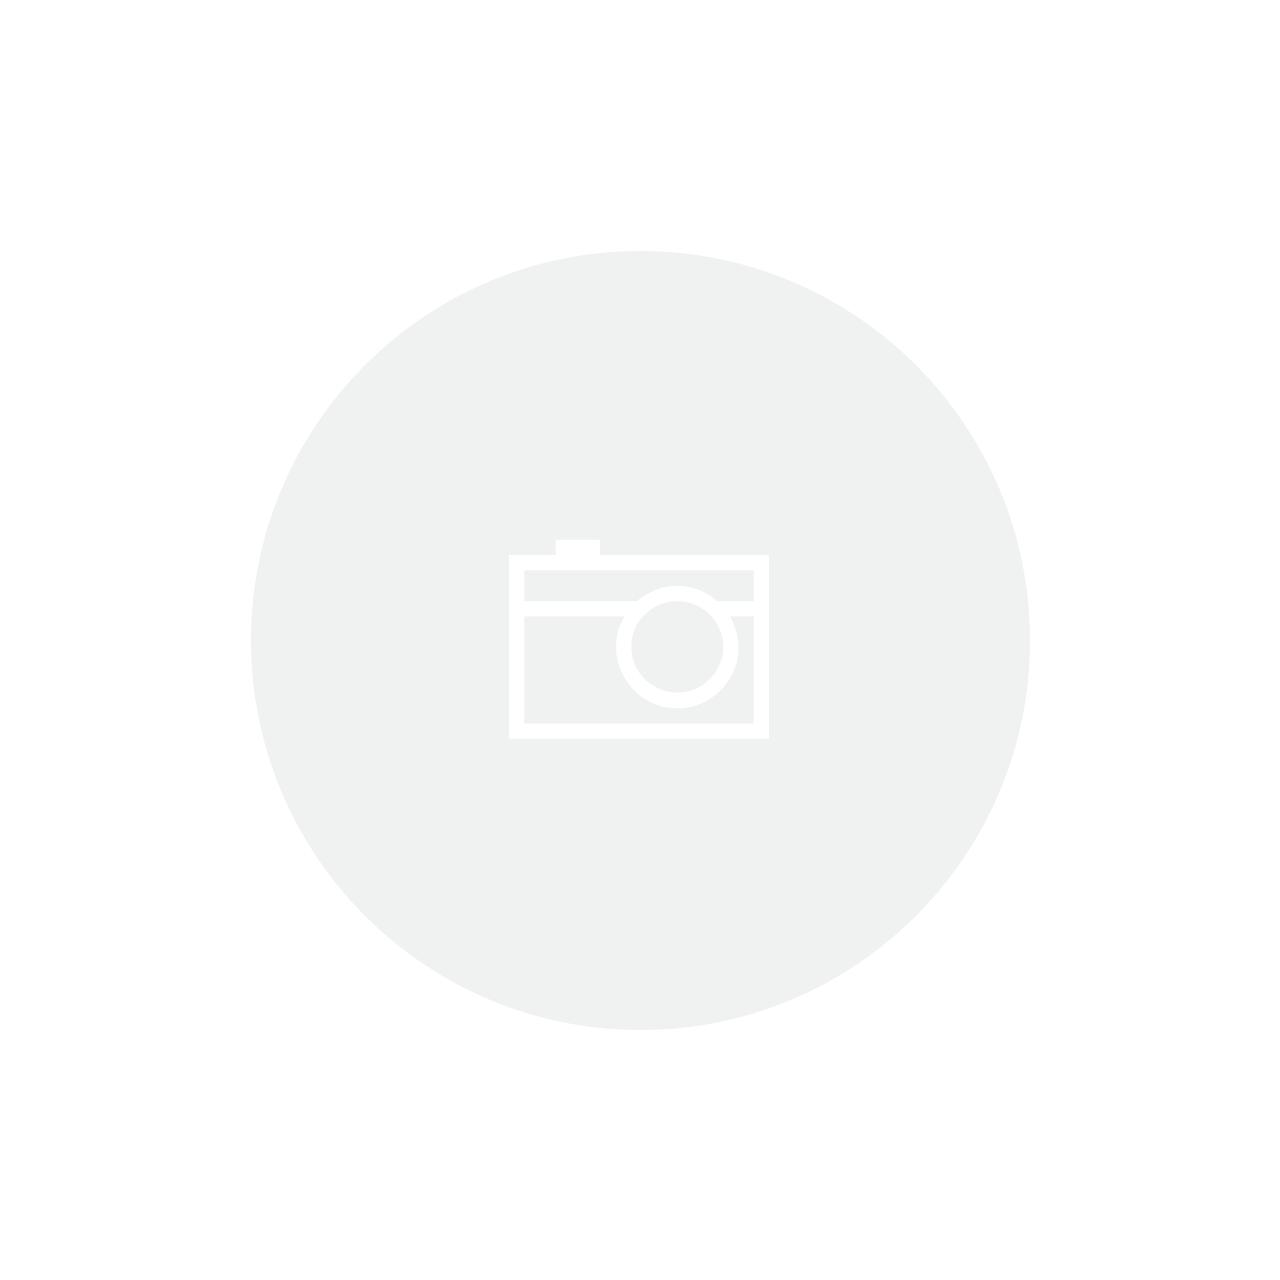 Assadeira Inox Tampa de Vidro 39cm Cosmos Tramontina